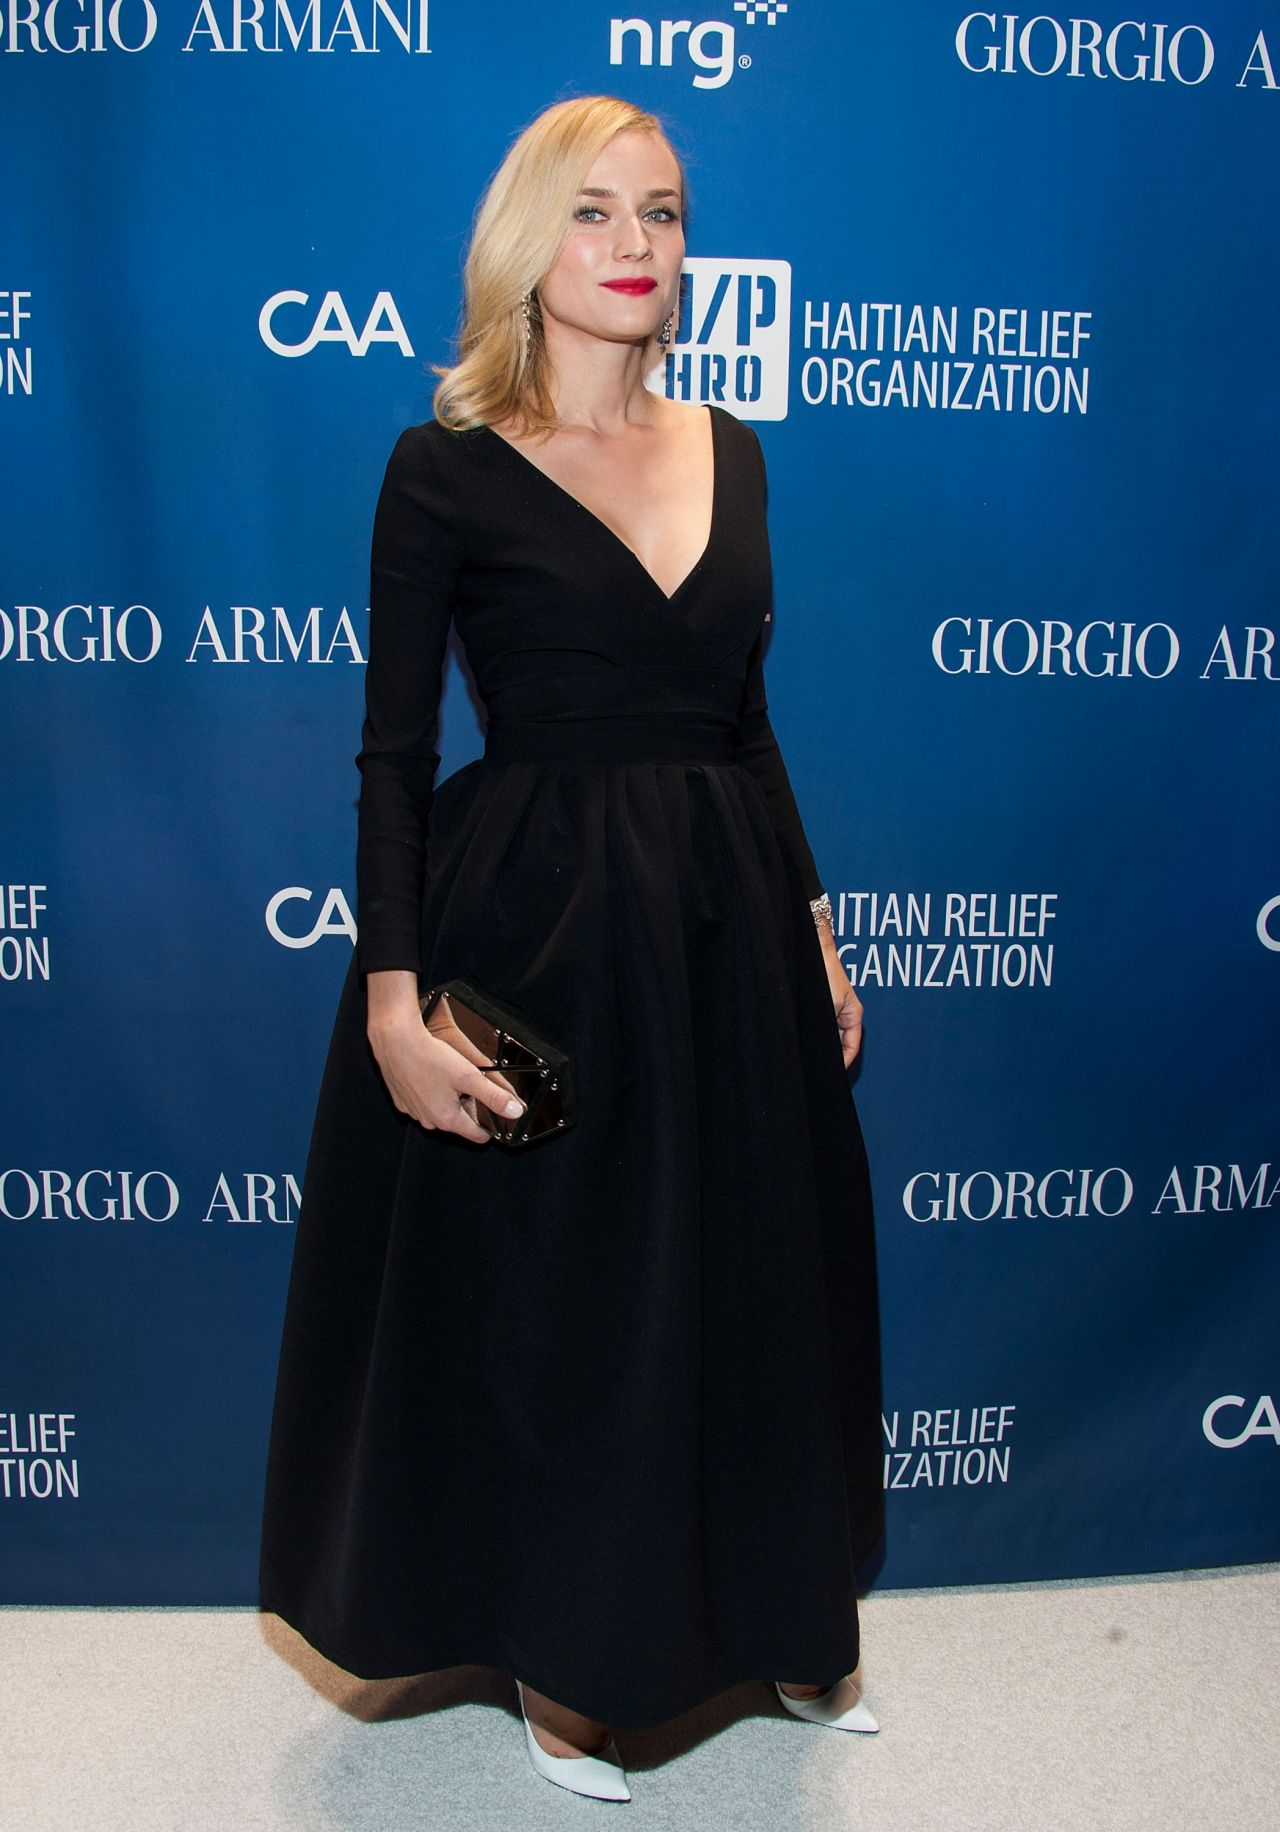 Diane Kruger Wears Preen at Sean Penn & Friends Help Haiti Home Gala, January 2014